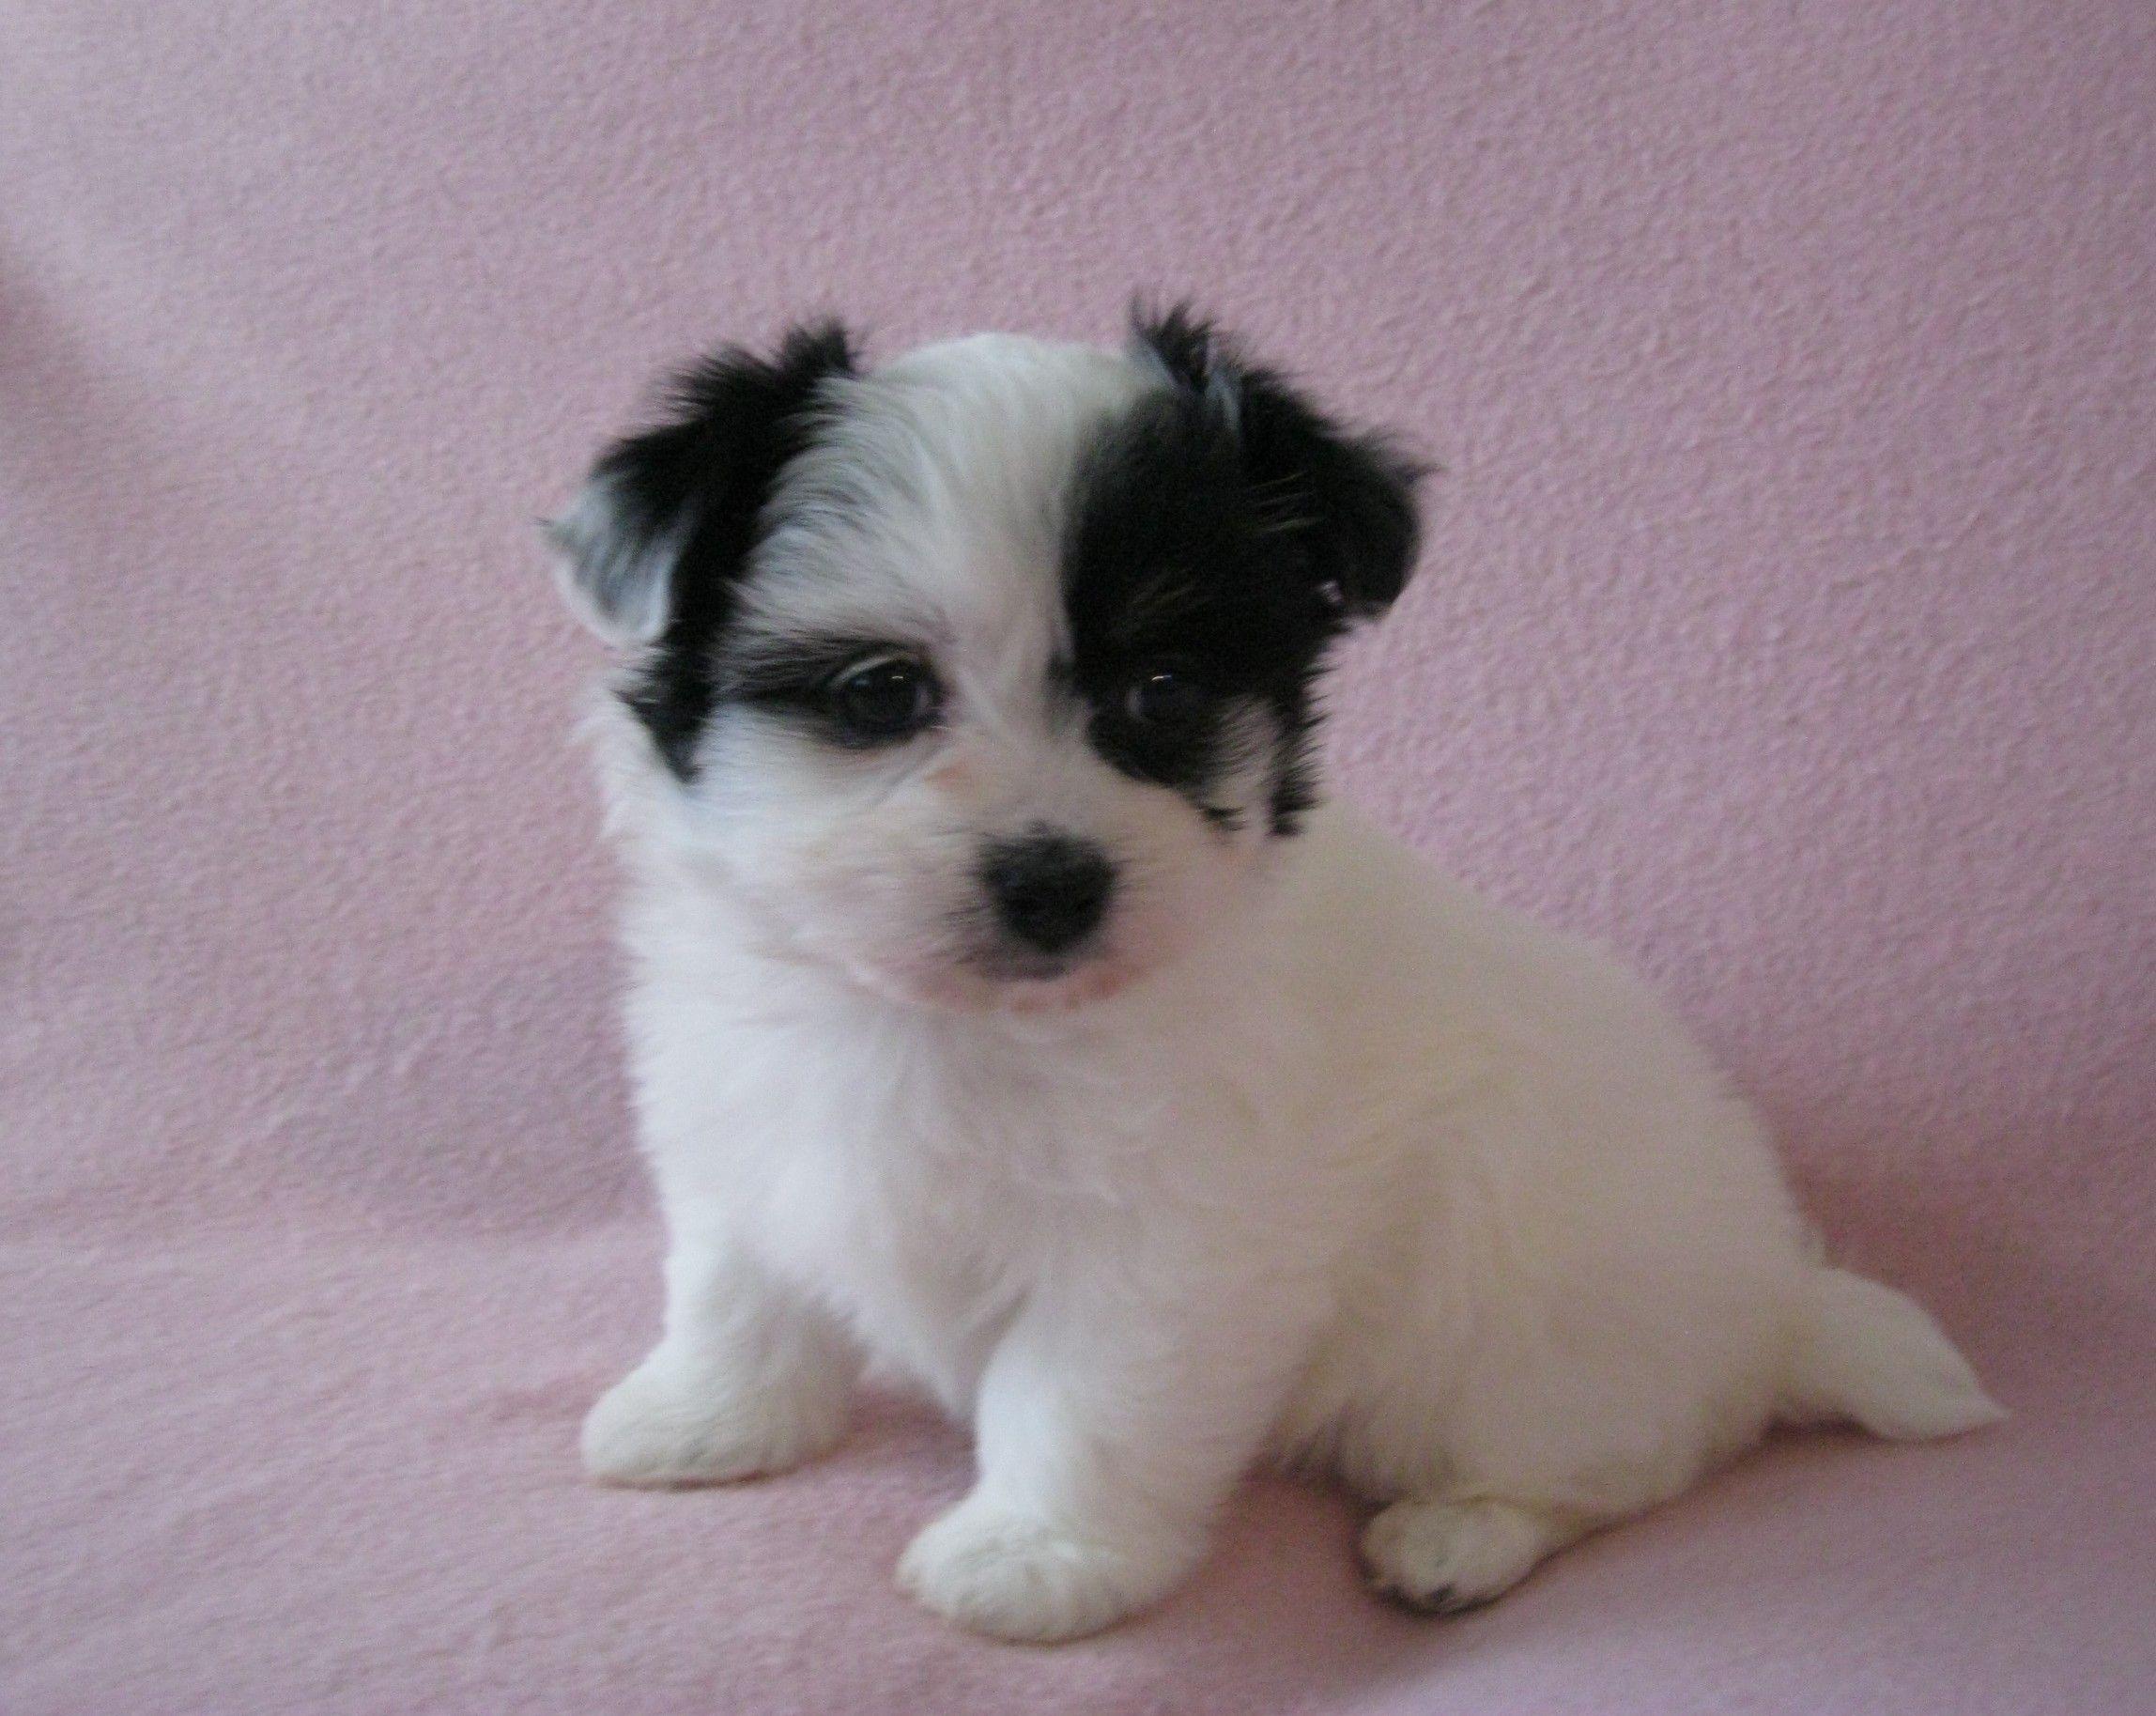 Havanese Puppies For Sale Http Www Akchavanese Com Havanese Puppies For Sale Havanese Puppies Havanese